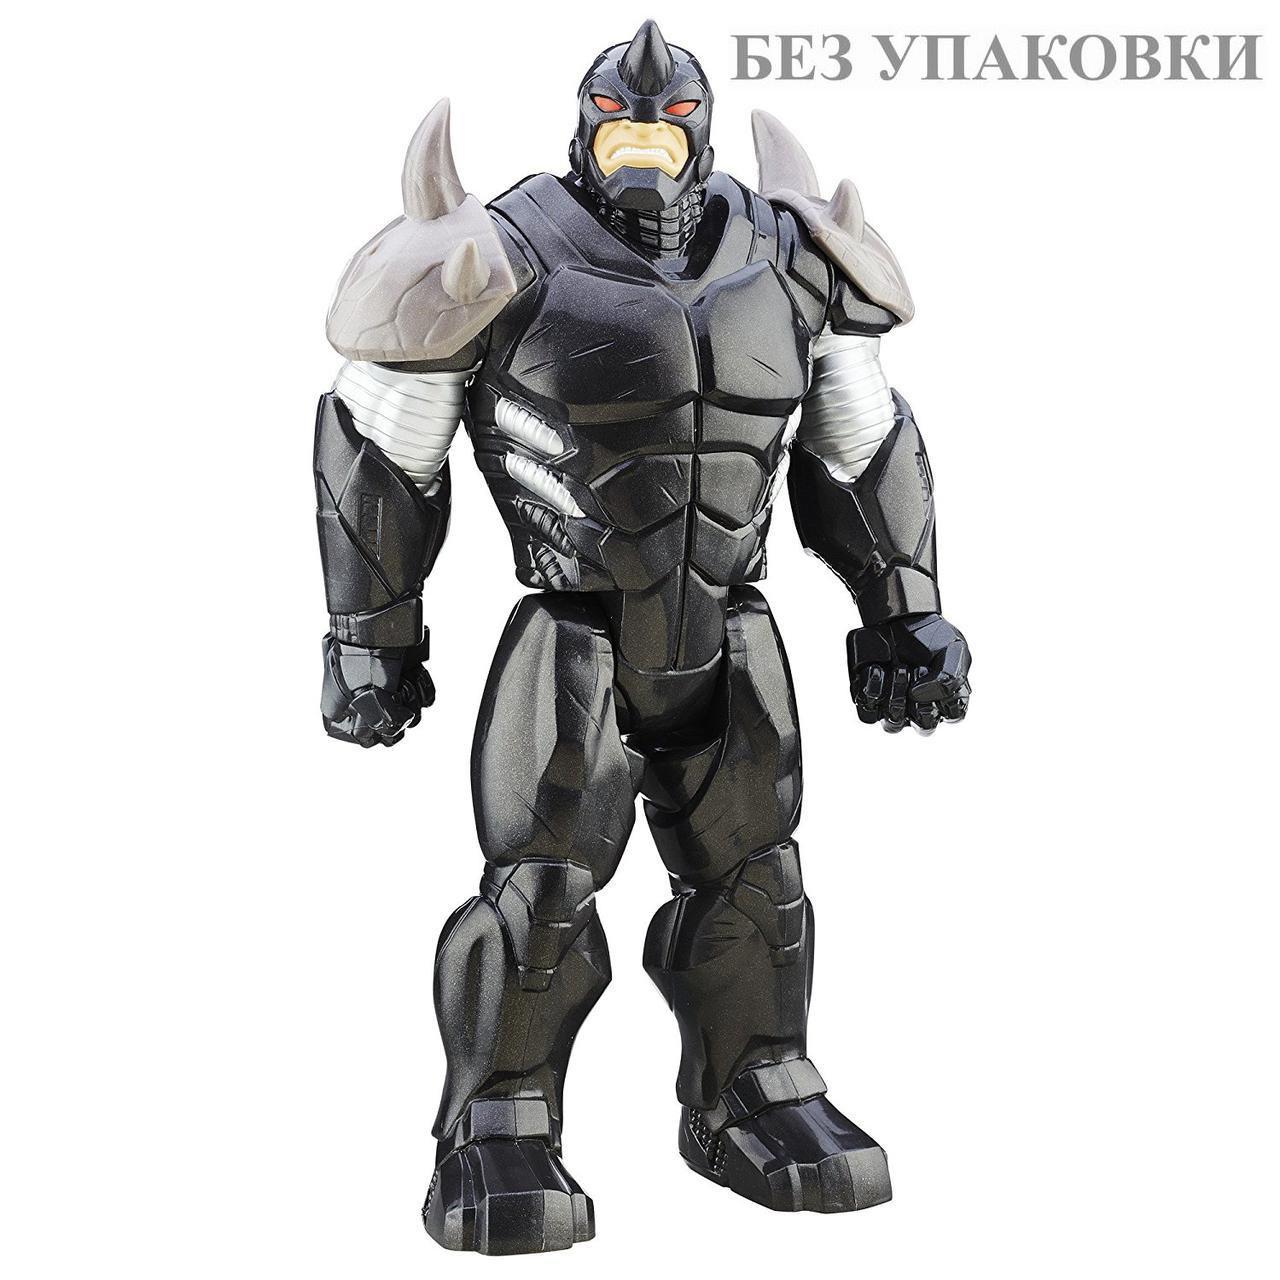 "Фигурка Носорог высота 30см ""Зловещая Шестерка"" - Rhino, Sinister6, Titans, Hasbro"